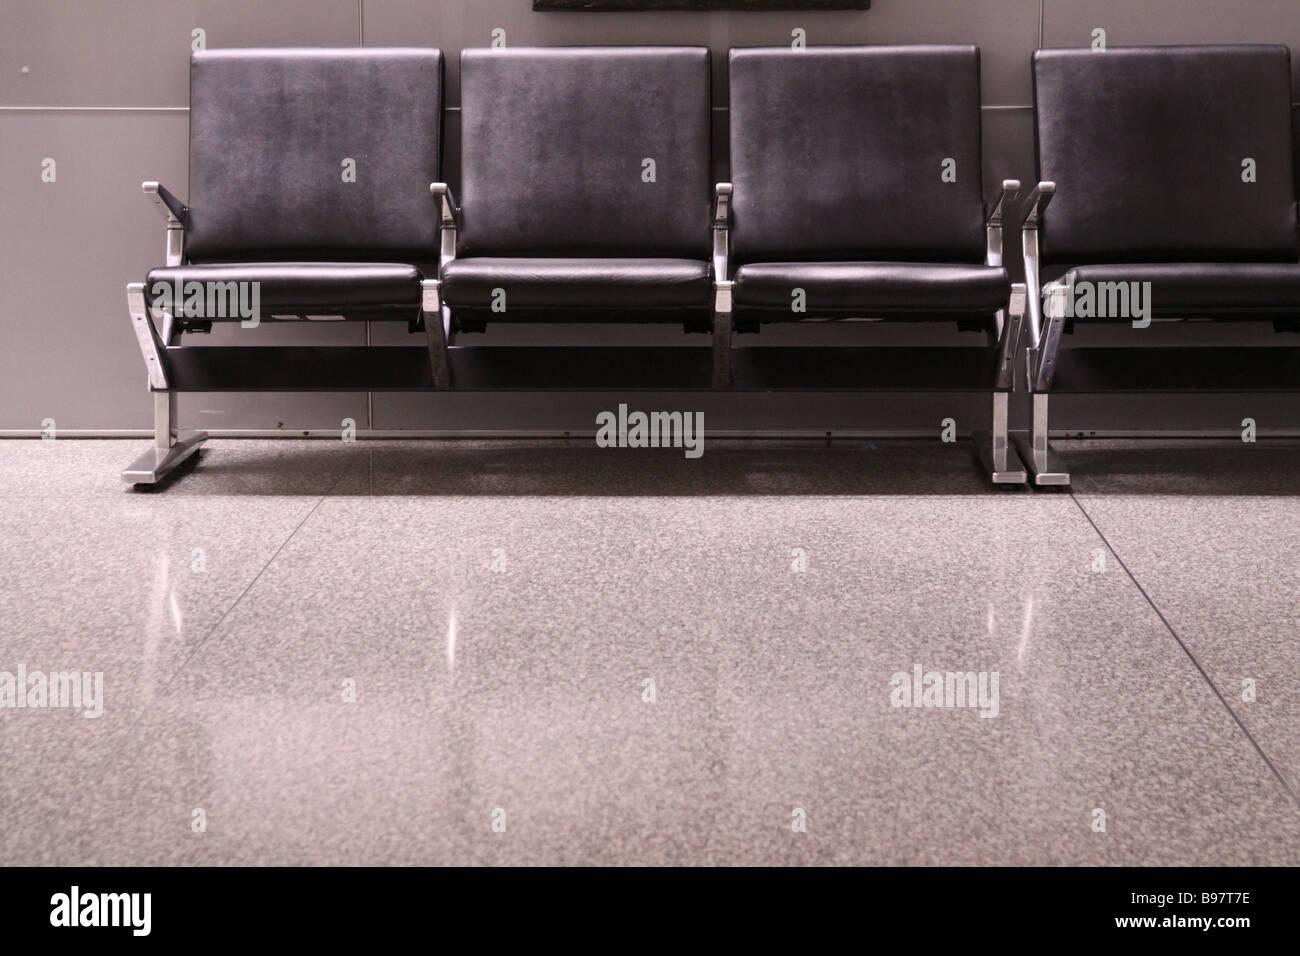 sfo terminal seats - Stock Image